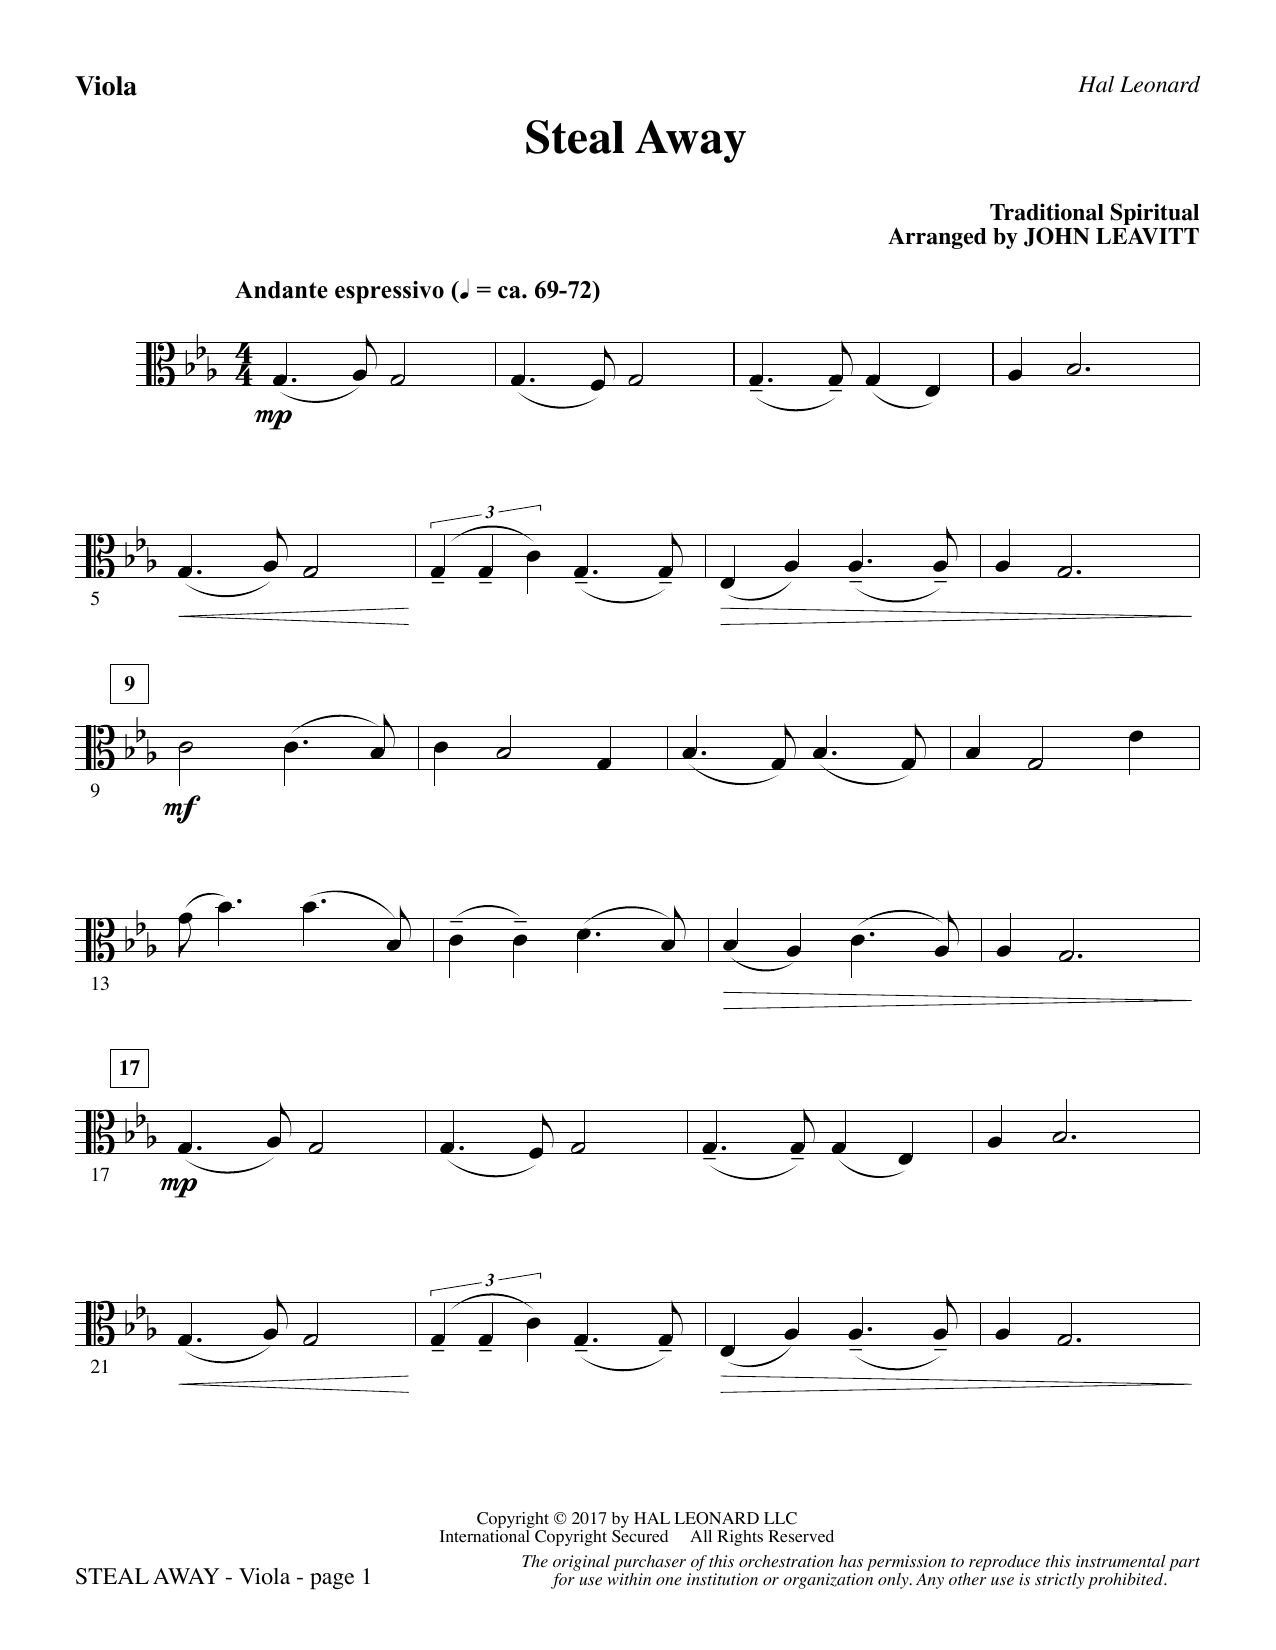 John Leavitt Steal Away - Viola sheet music notes and chords. Download Printable PDF.